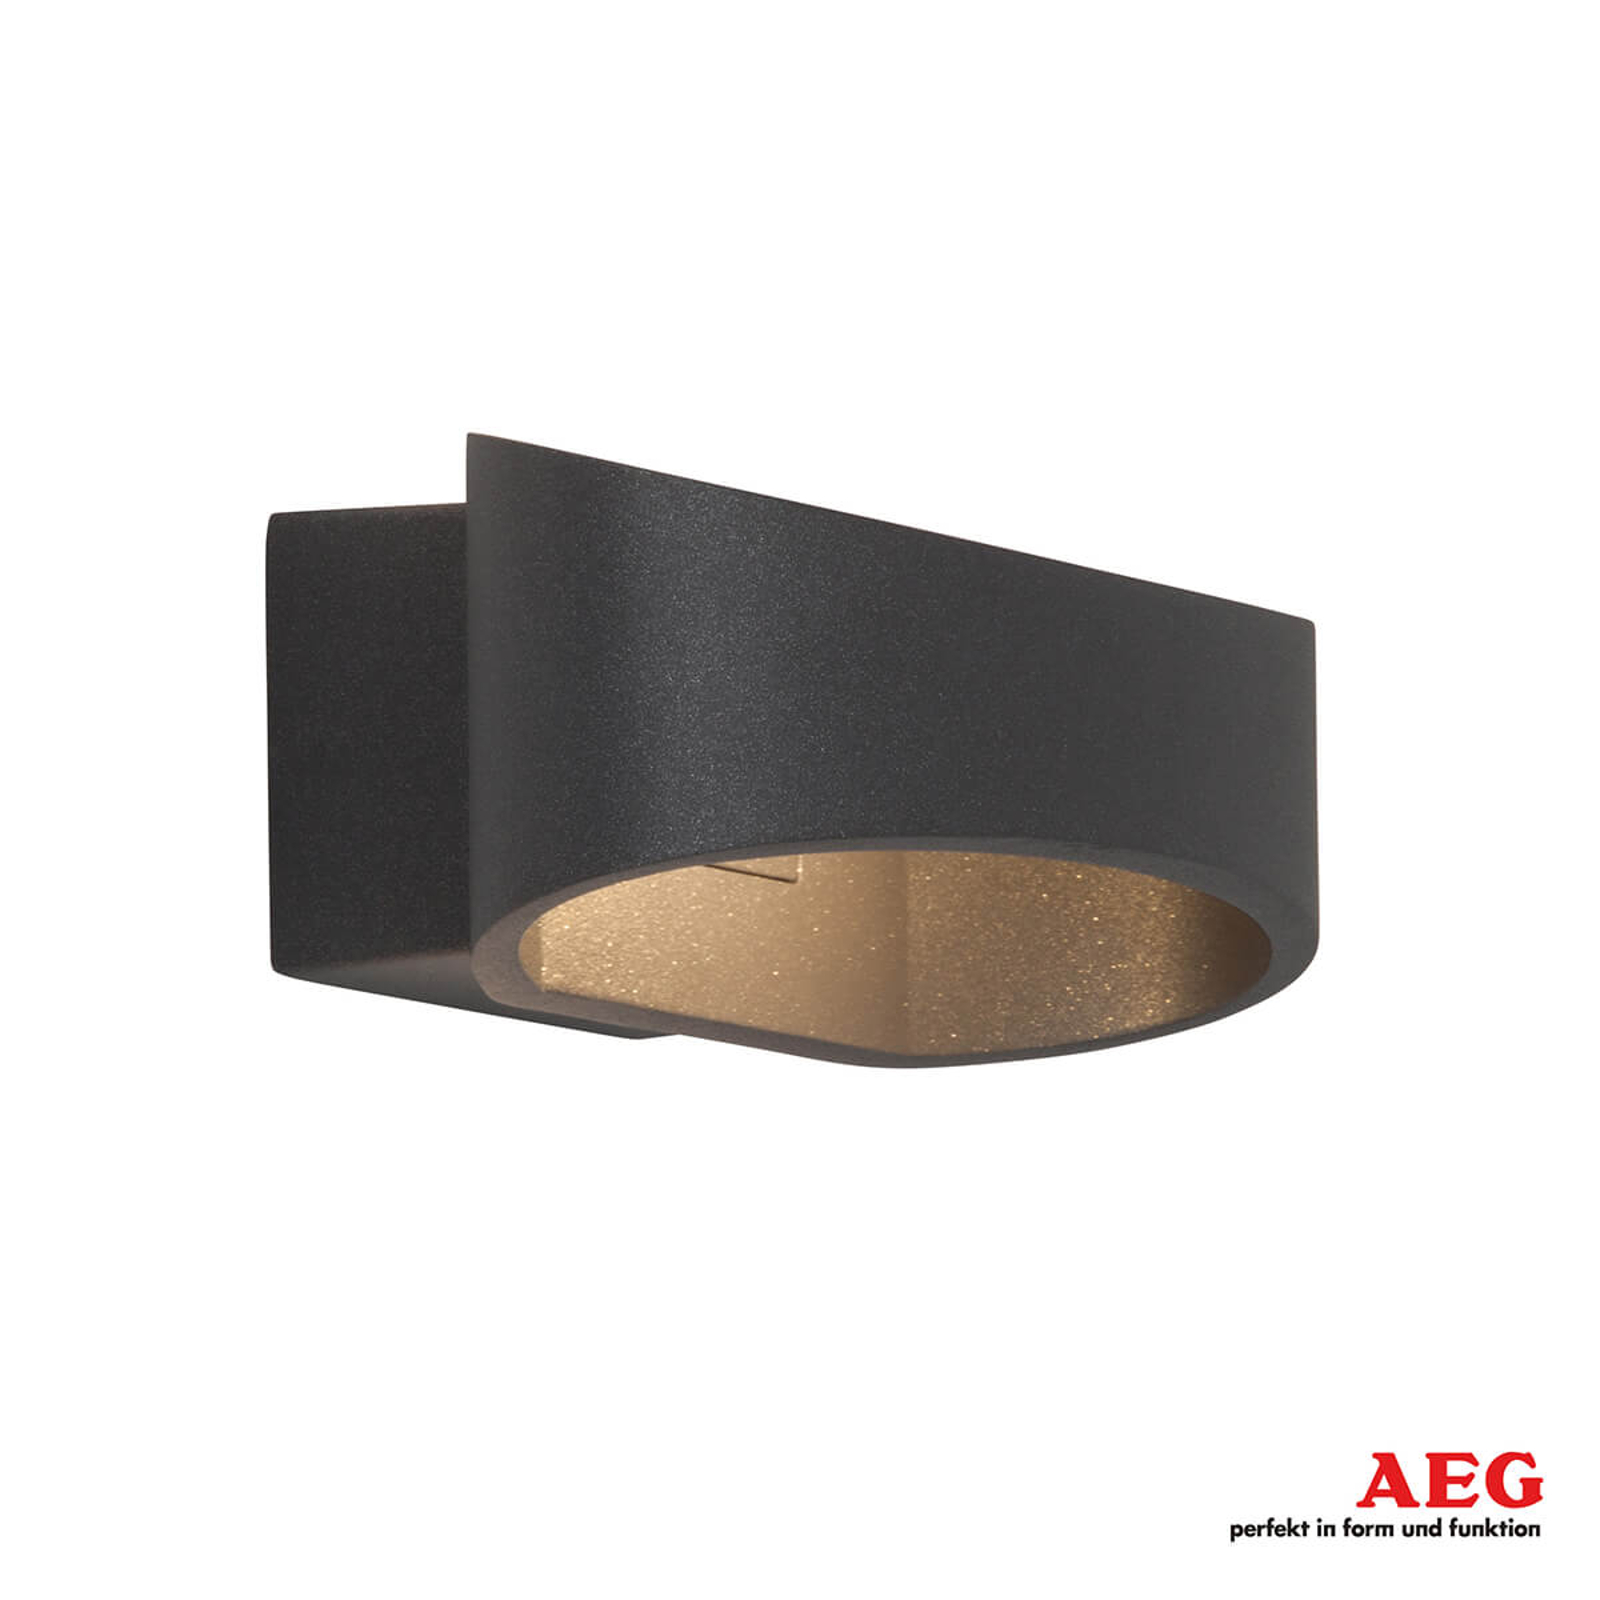 AEG Sunrise abwärts strahlende LED-Außenwandlampe